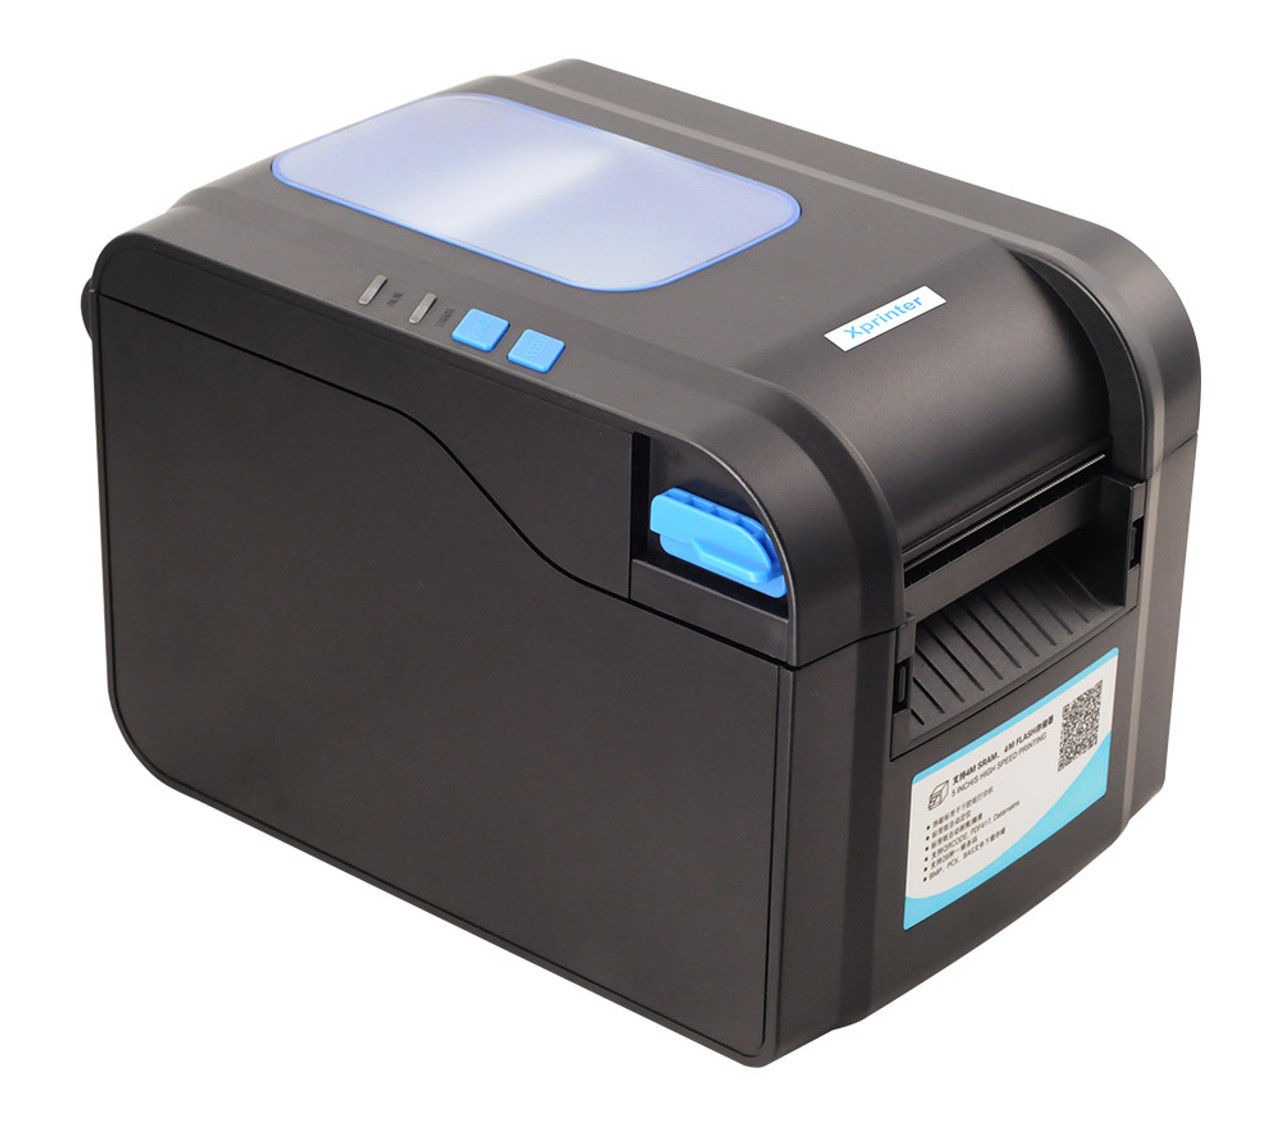 XPRINTER Thermal Barcode Printer XP-370B